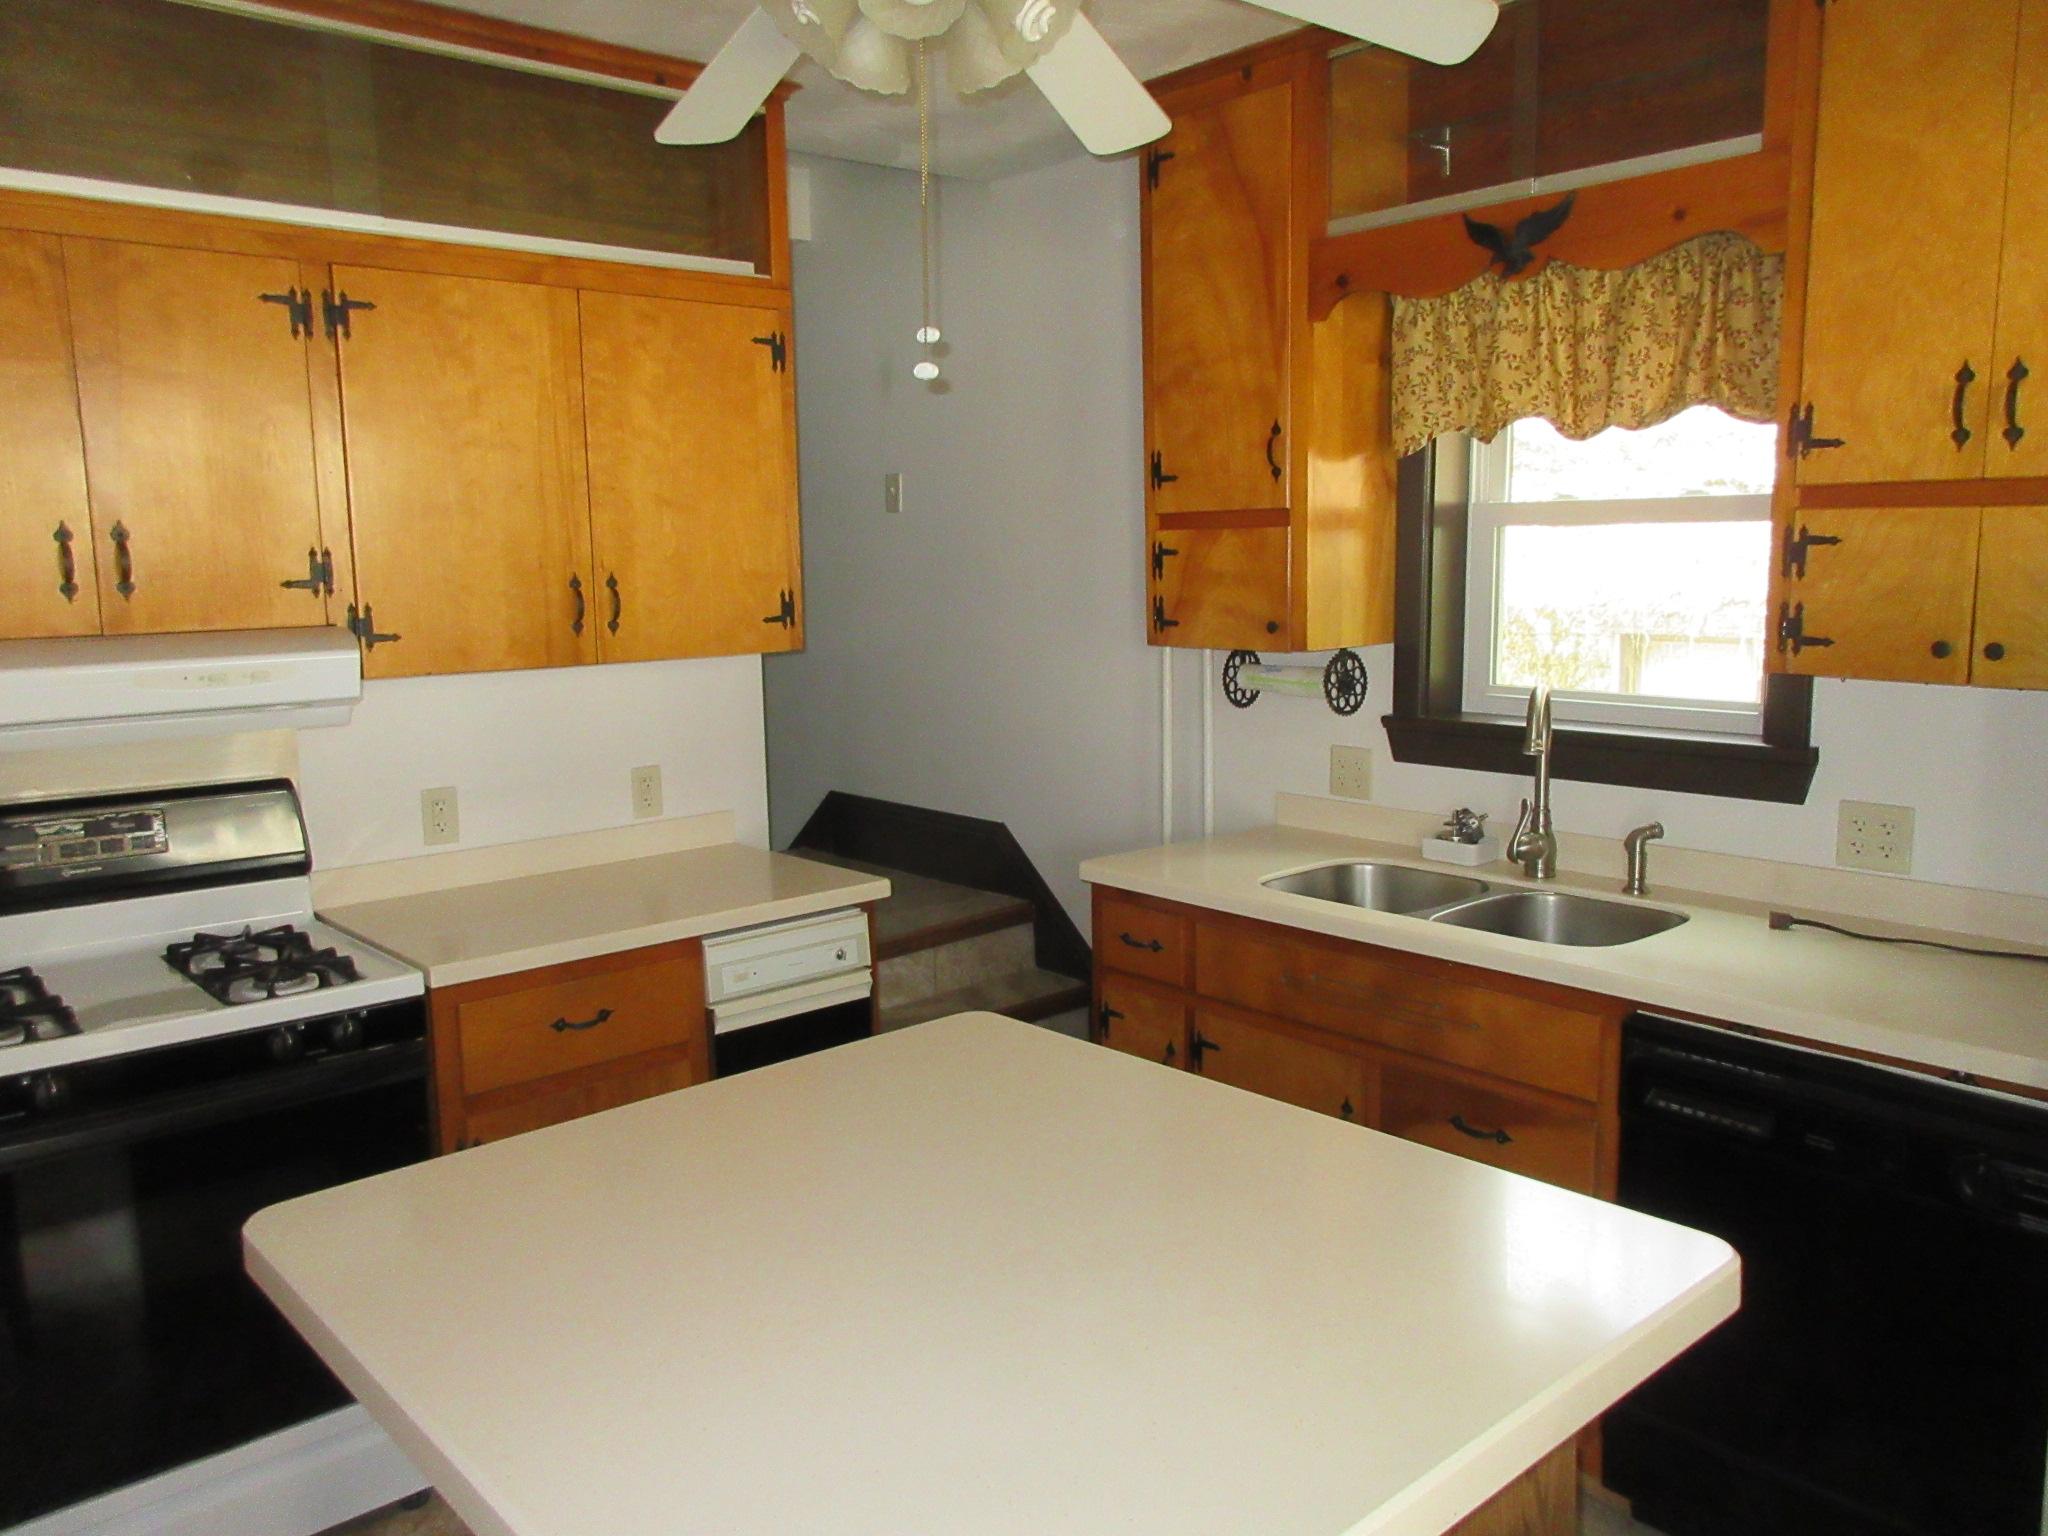 177 Vineyard Lane, Duncansville Kitchen pic